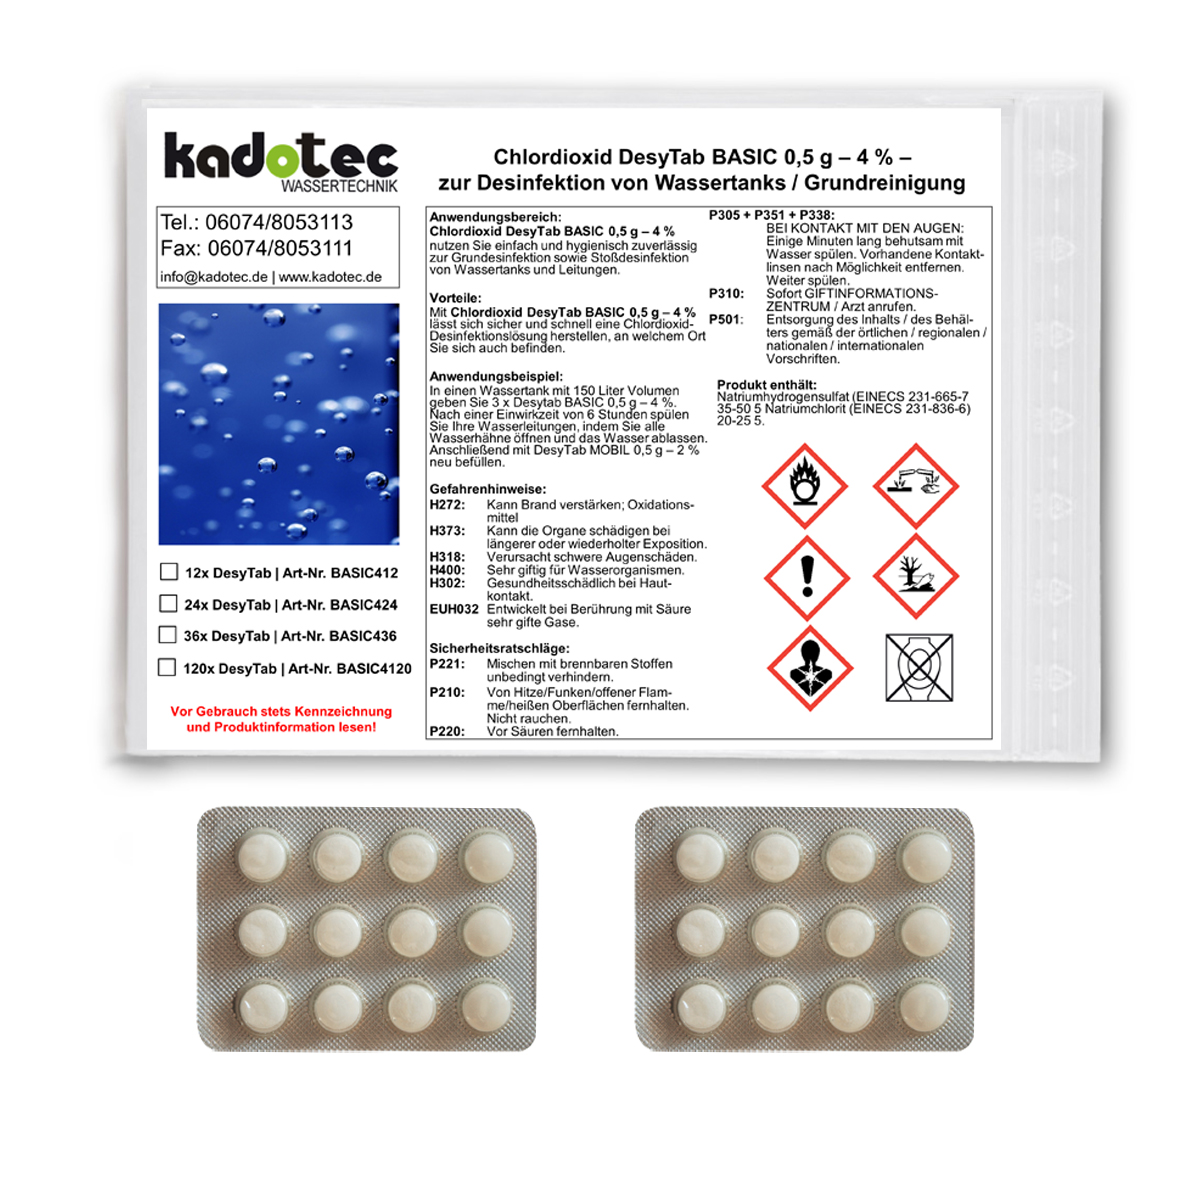 Chlordioxid Tabletten BASIC 0,5 g  4 /% Wassertank-Desinfektion 36x Tabs